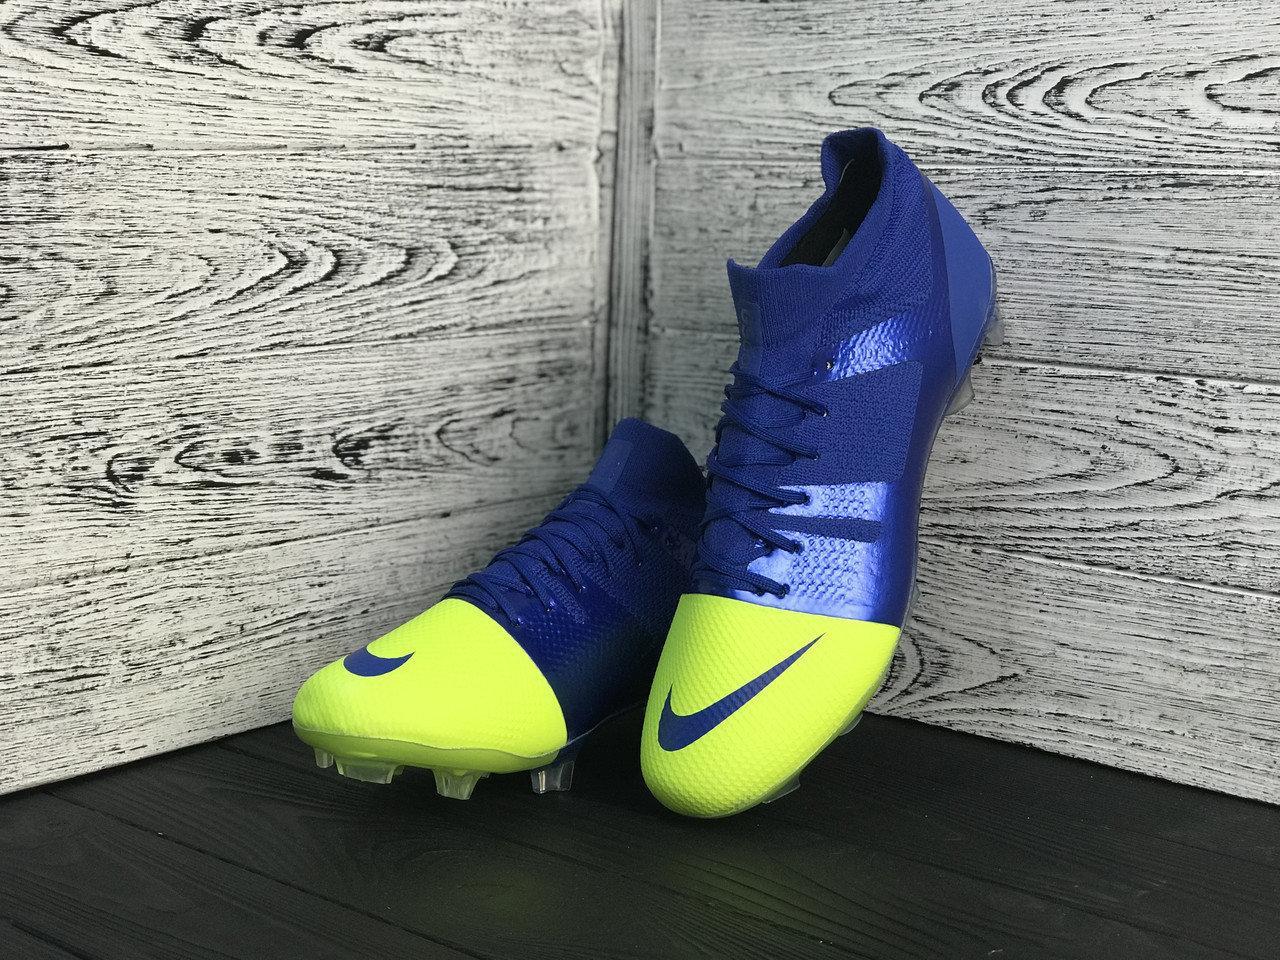 Бутсы Nike Mercurial 360 / найк меркуриал(реплика) /44,45/